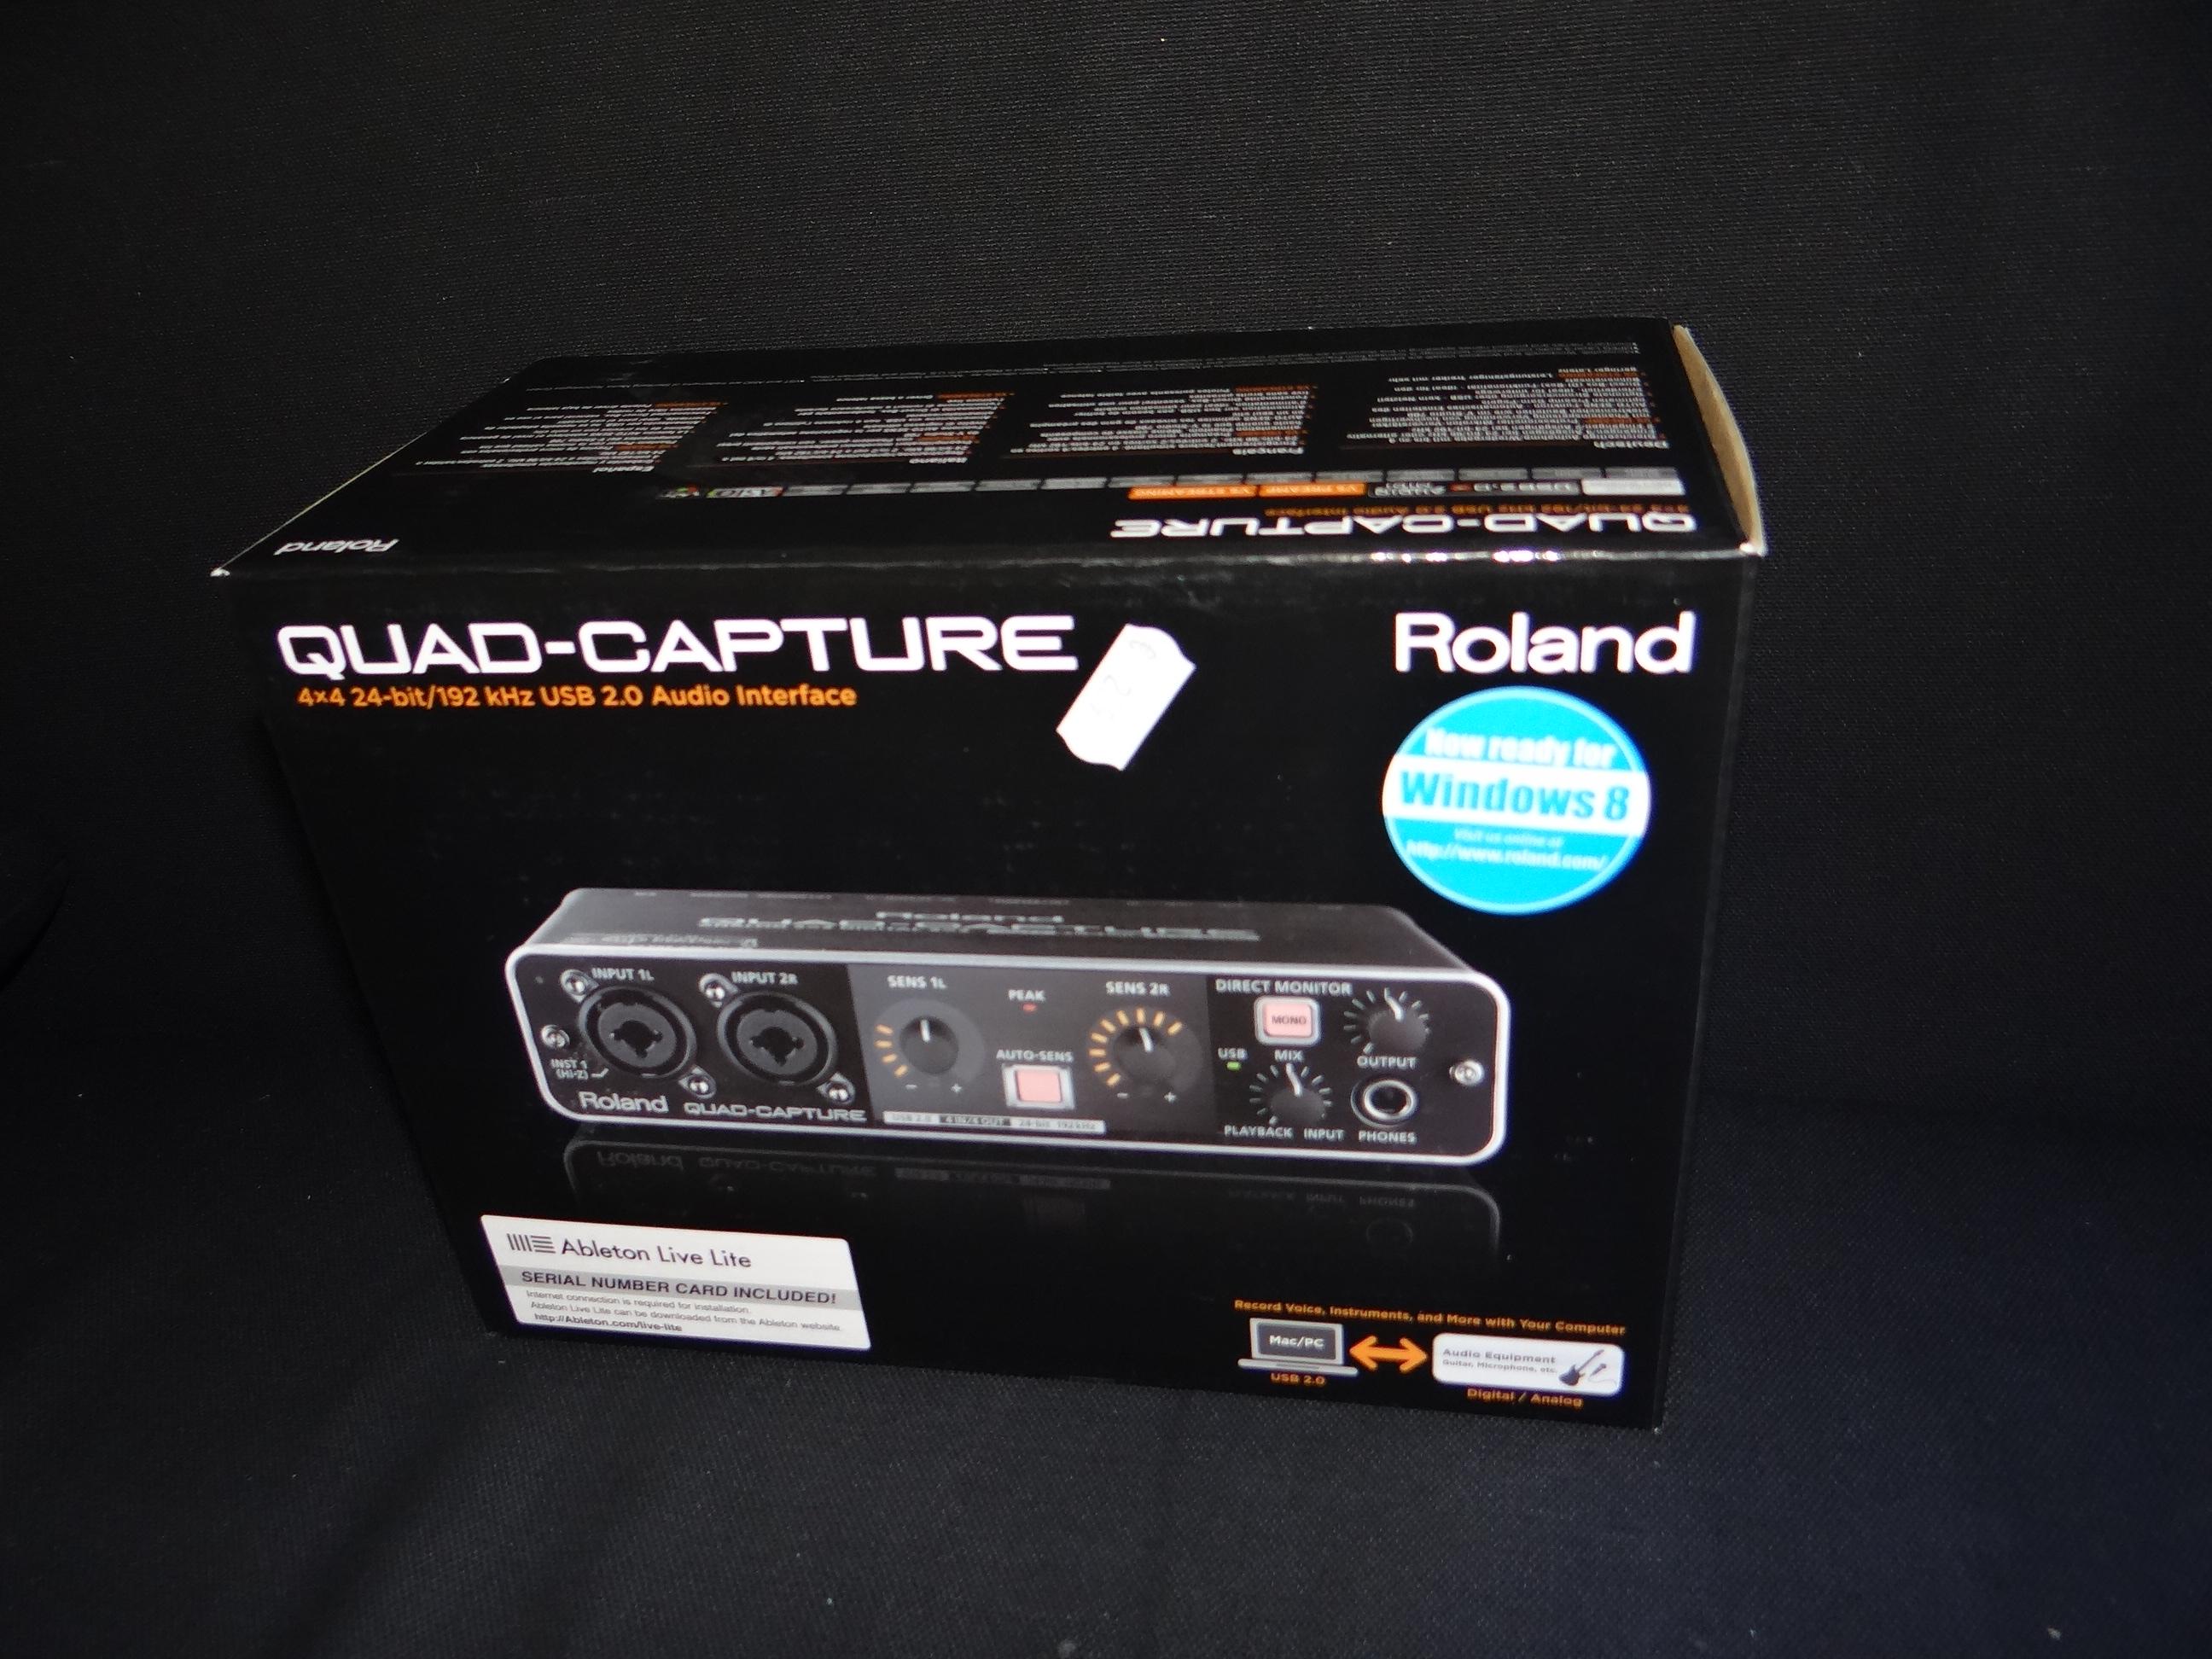 roland ua 55 quad capture image 1675919 audiofanzine. Black Bedroom Furniture Sets. Home Design Ideas